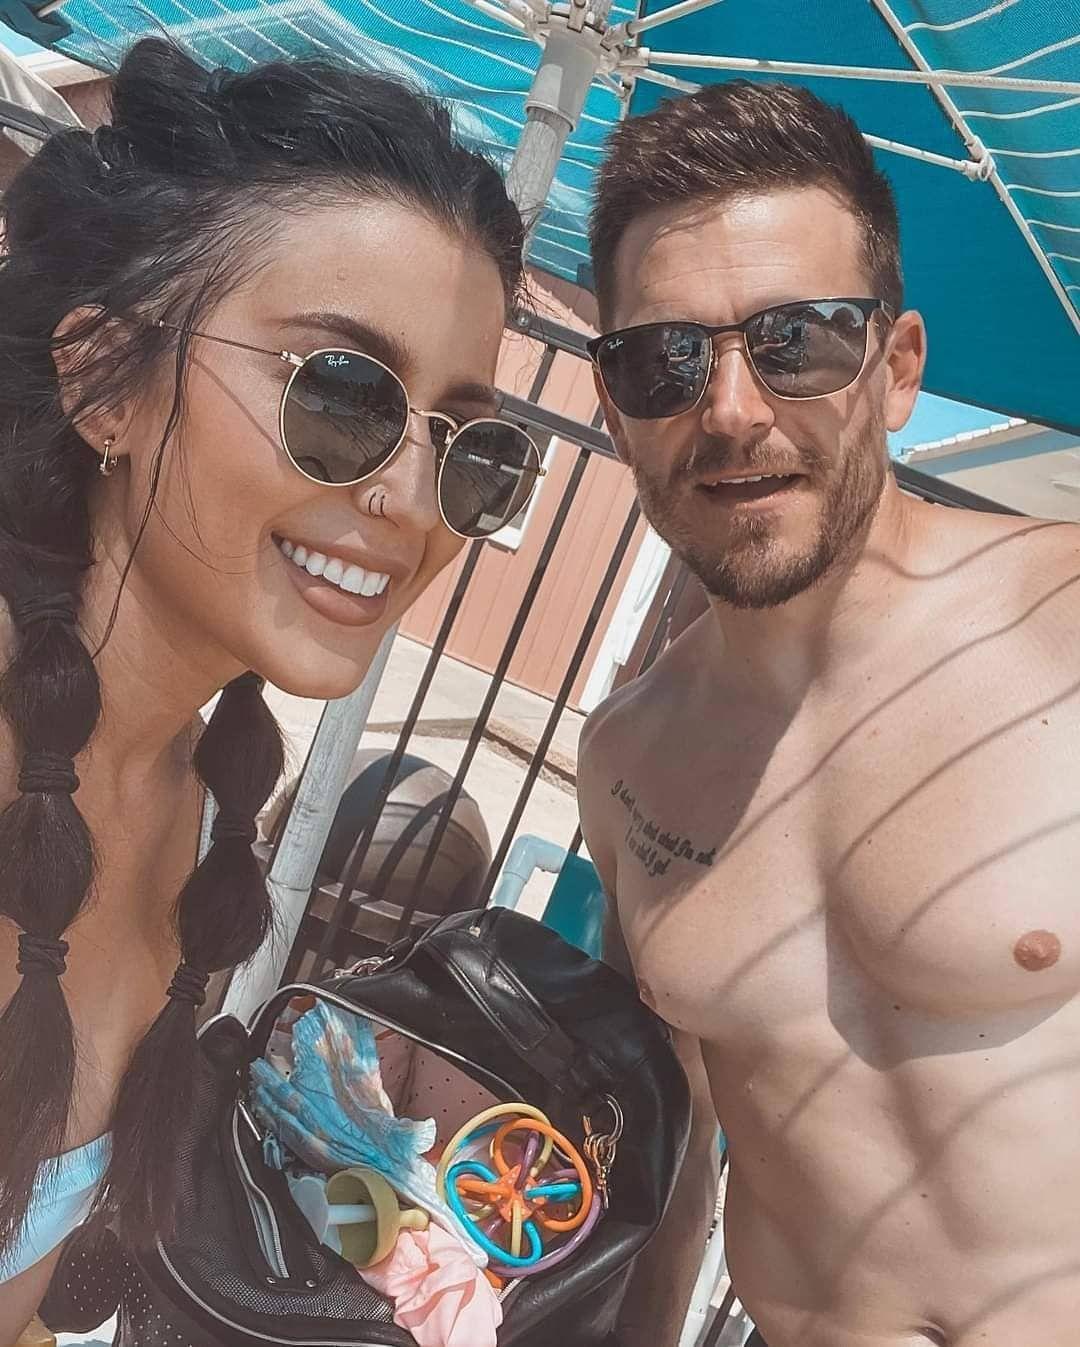 Chelsea Houska selfie with Cole DeBoer outdoors